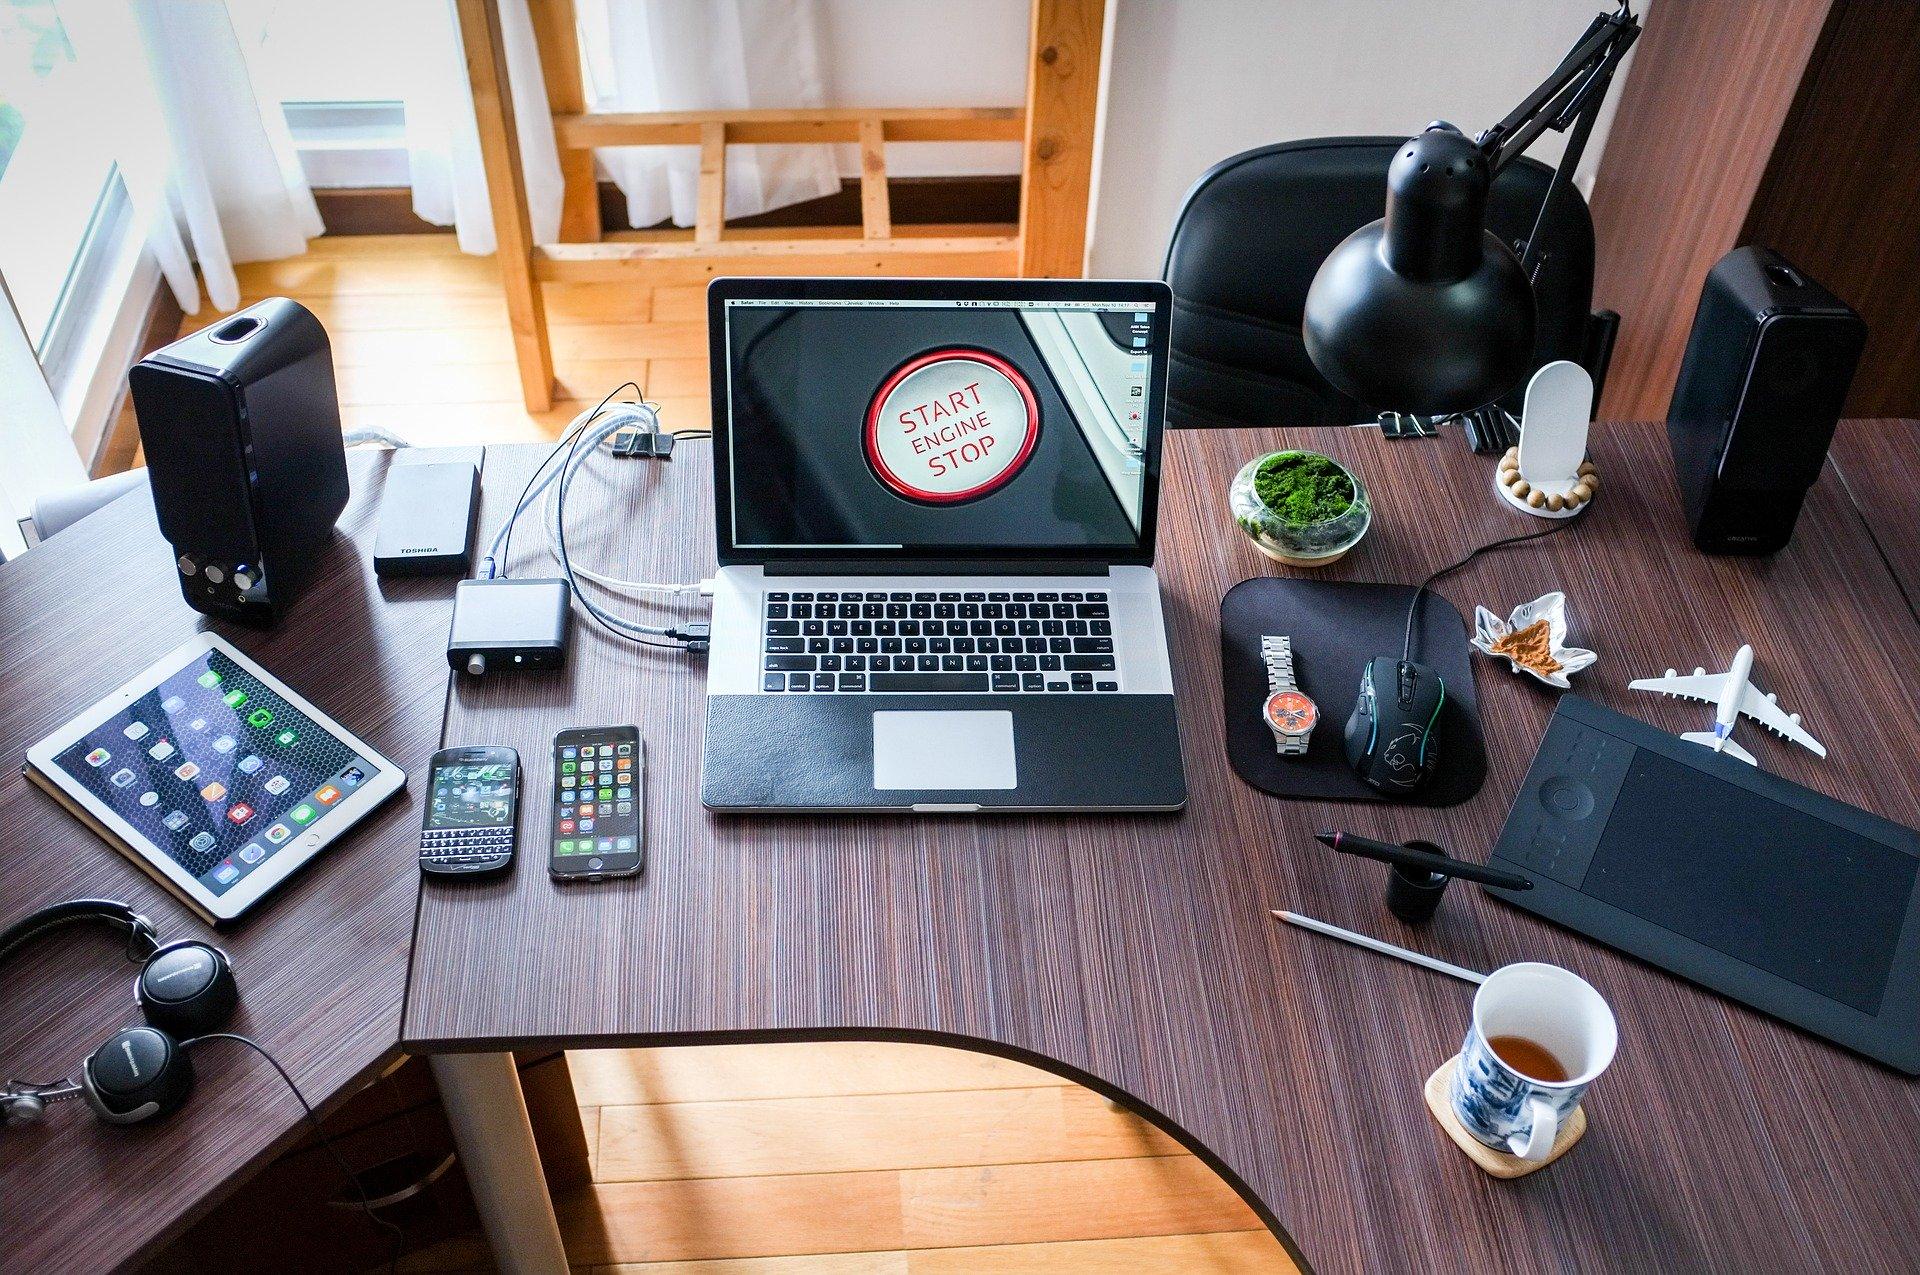 Laptop-based workspace